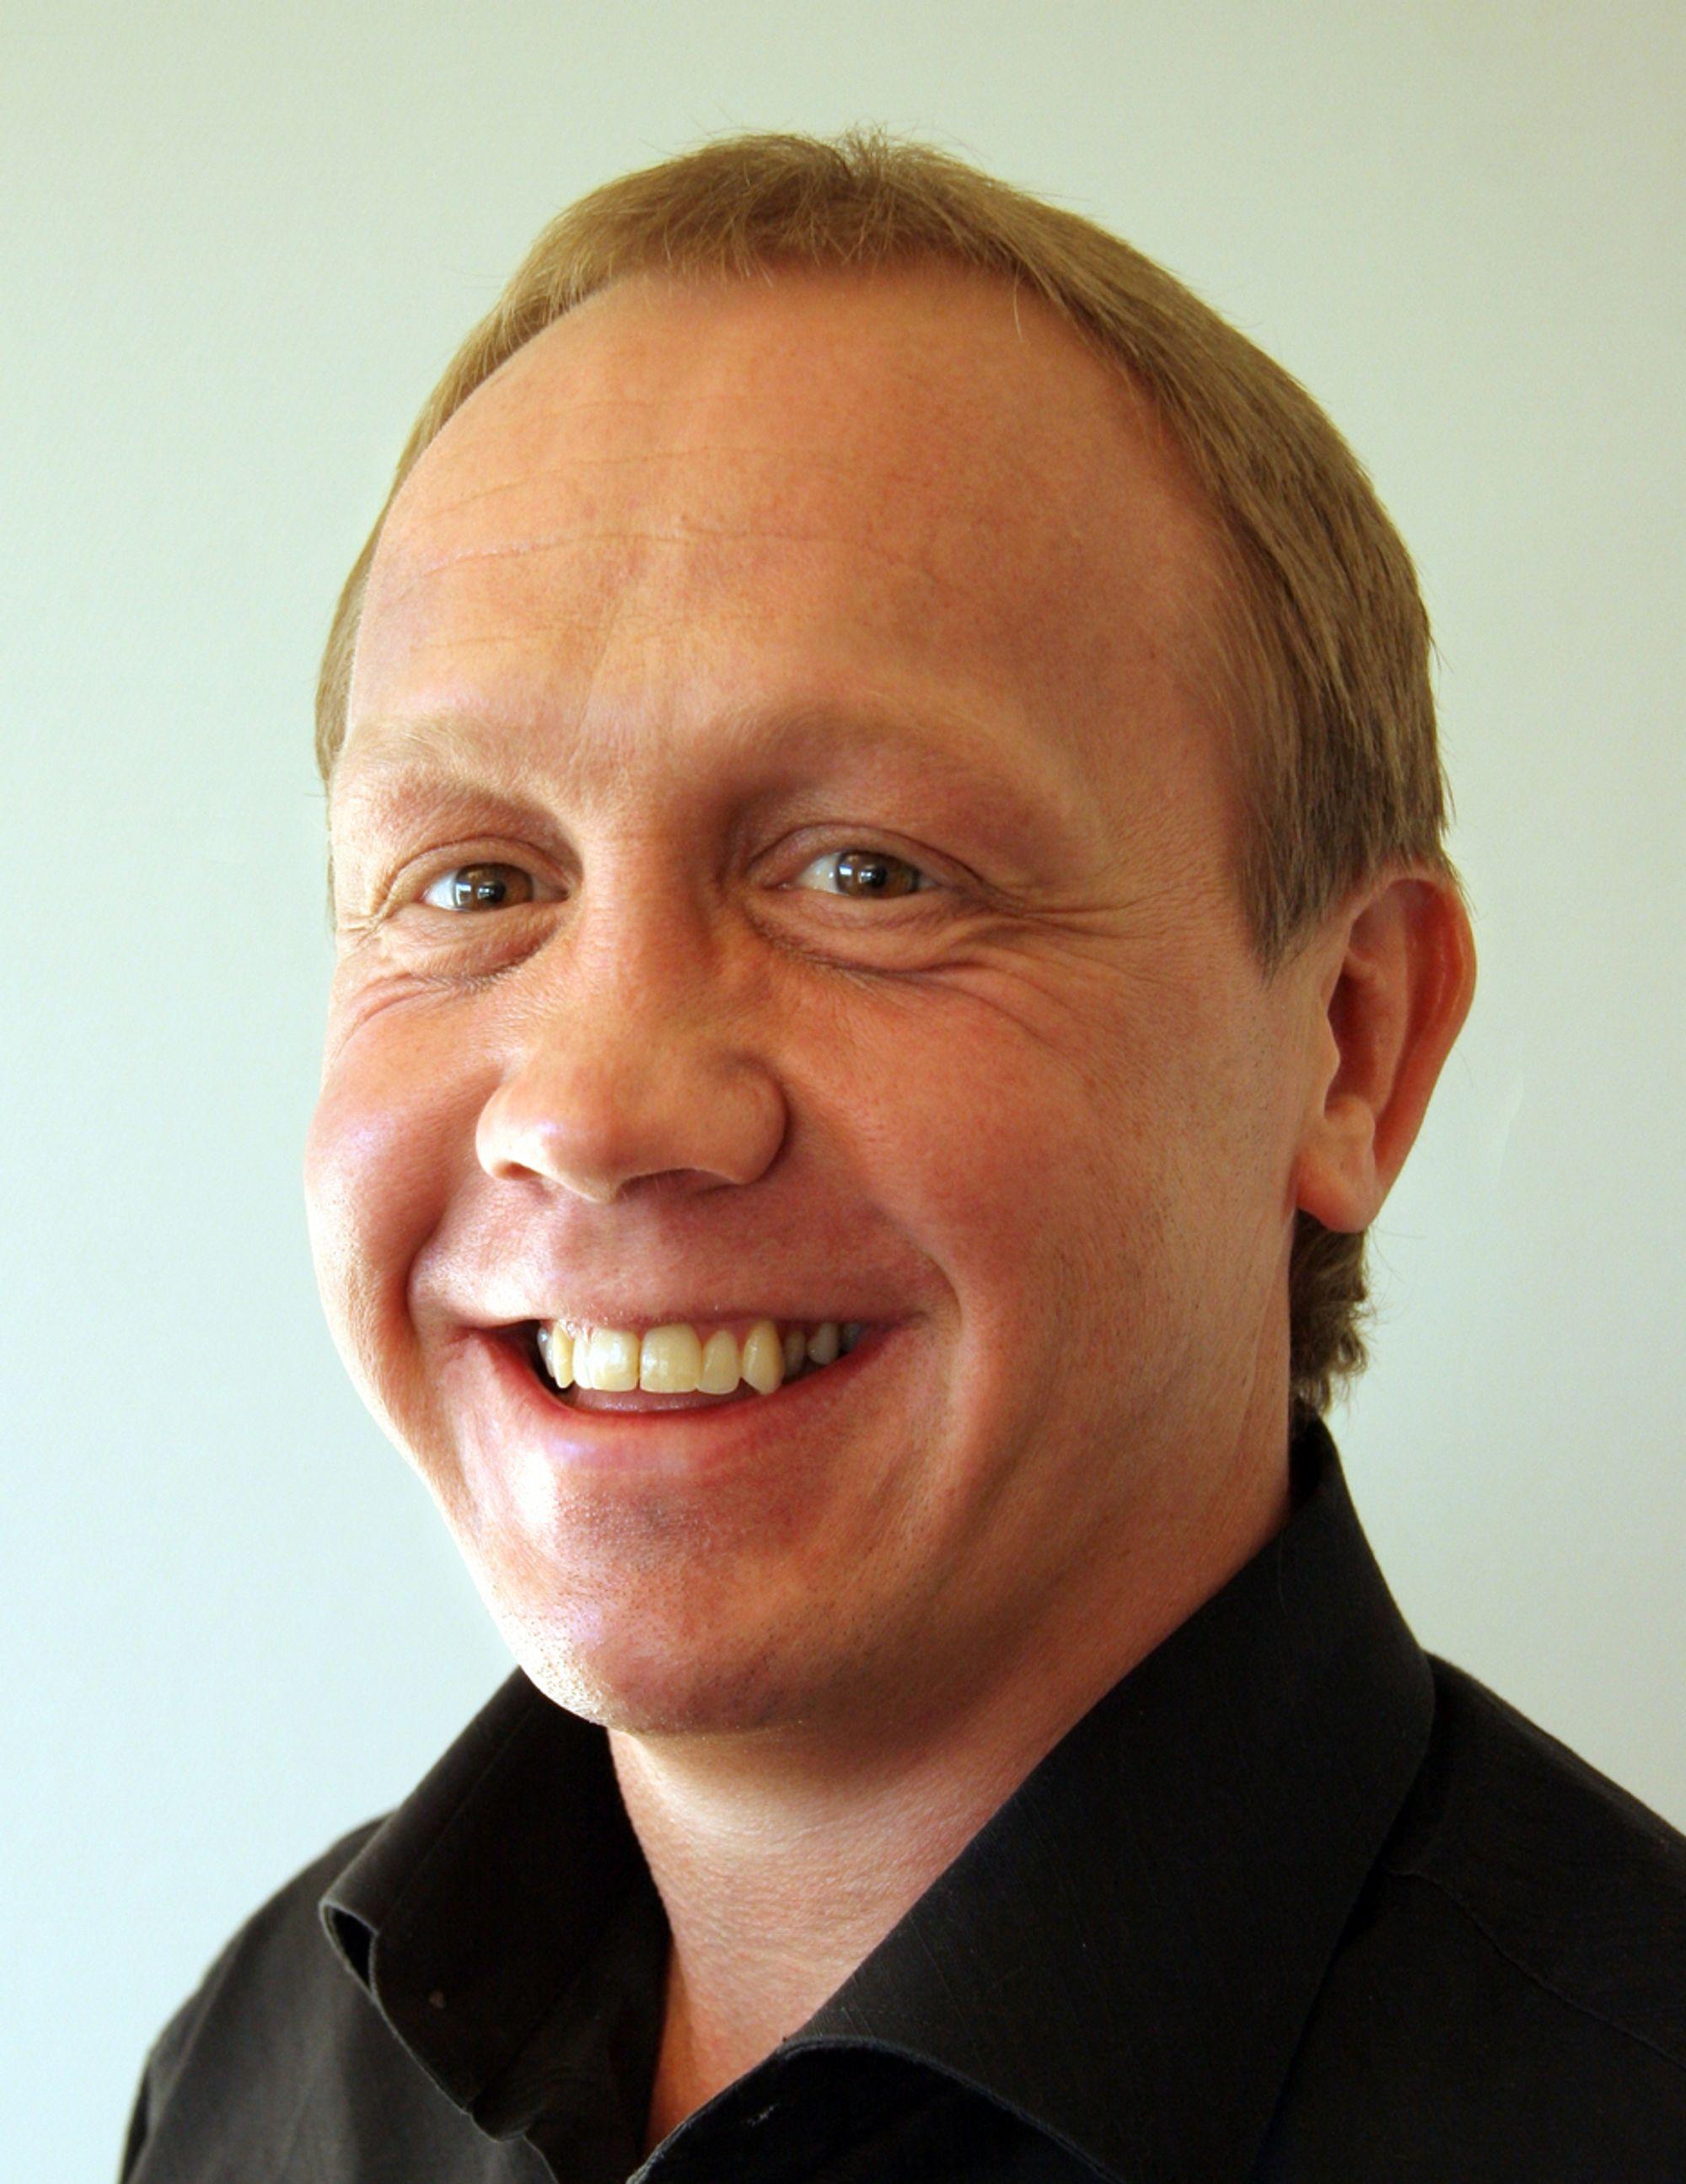 OVERBEVISTE: Daglig leder og IQ-gründer Jonny Tungen har begeistret giganten Microsoft med norsk data- og mobilteknologi.